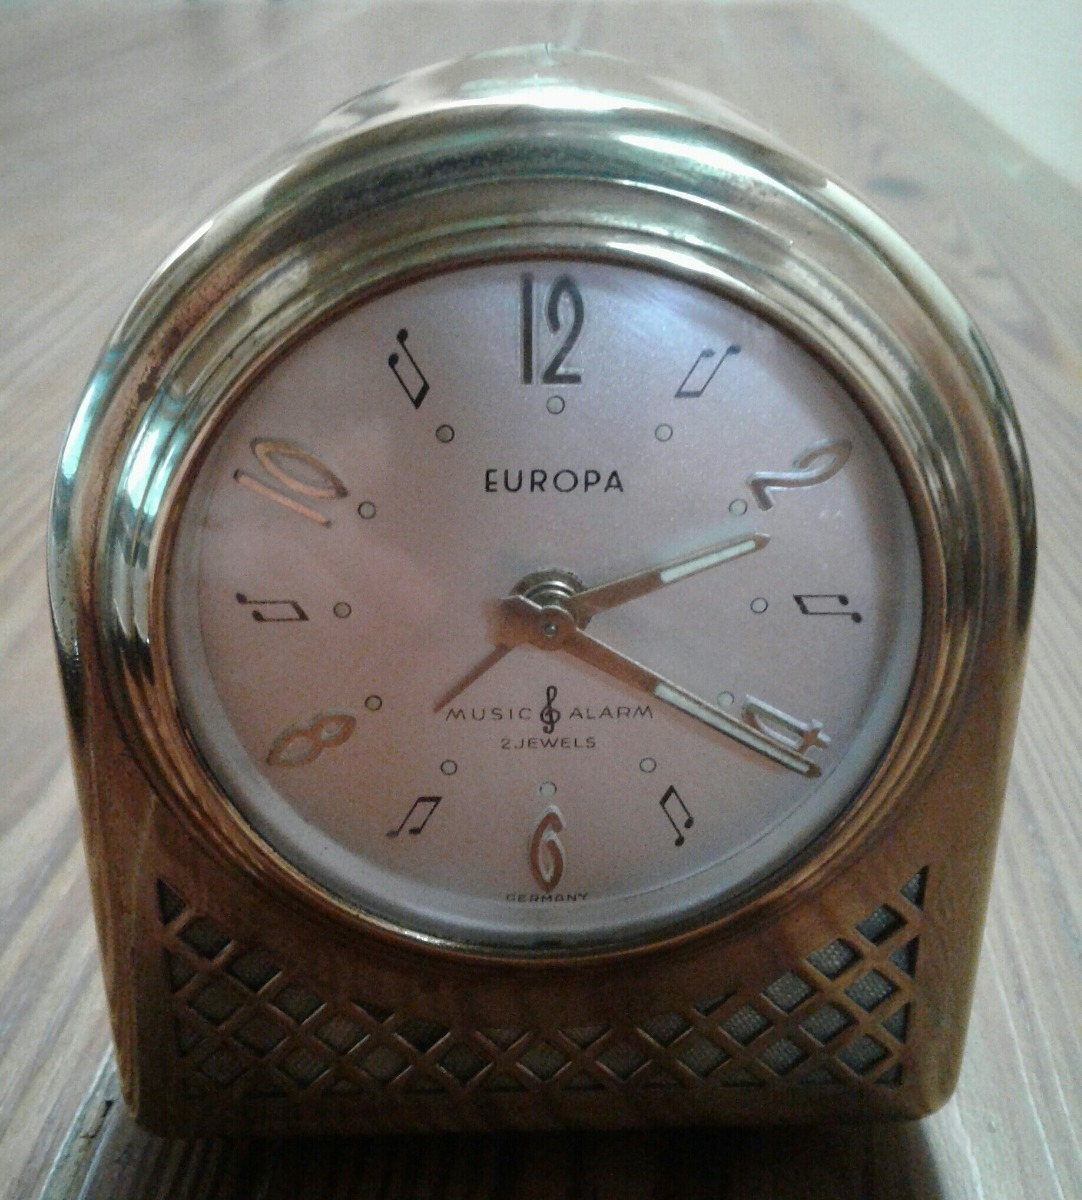 8023a64b491a antiguo reloj despertador europa cuerda bronce alemán. Cargando zoom.